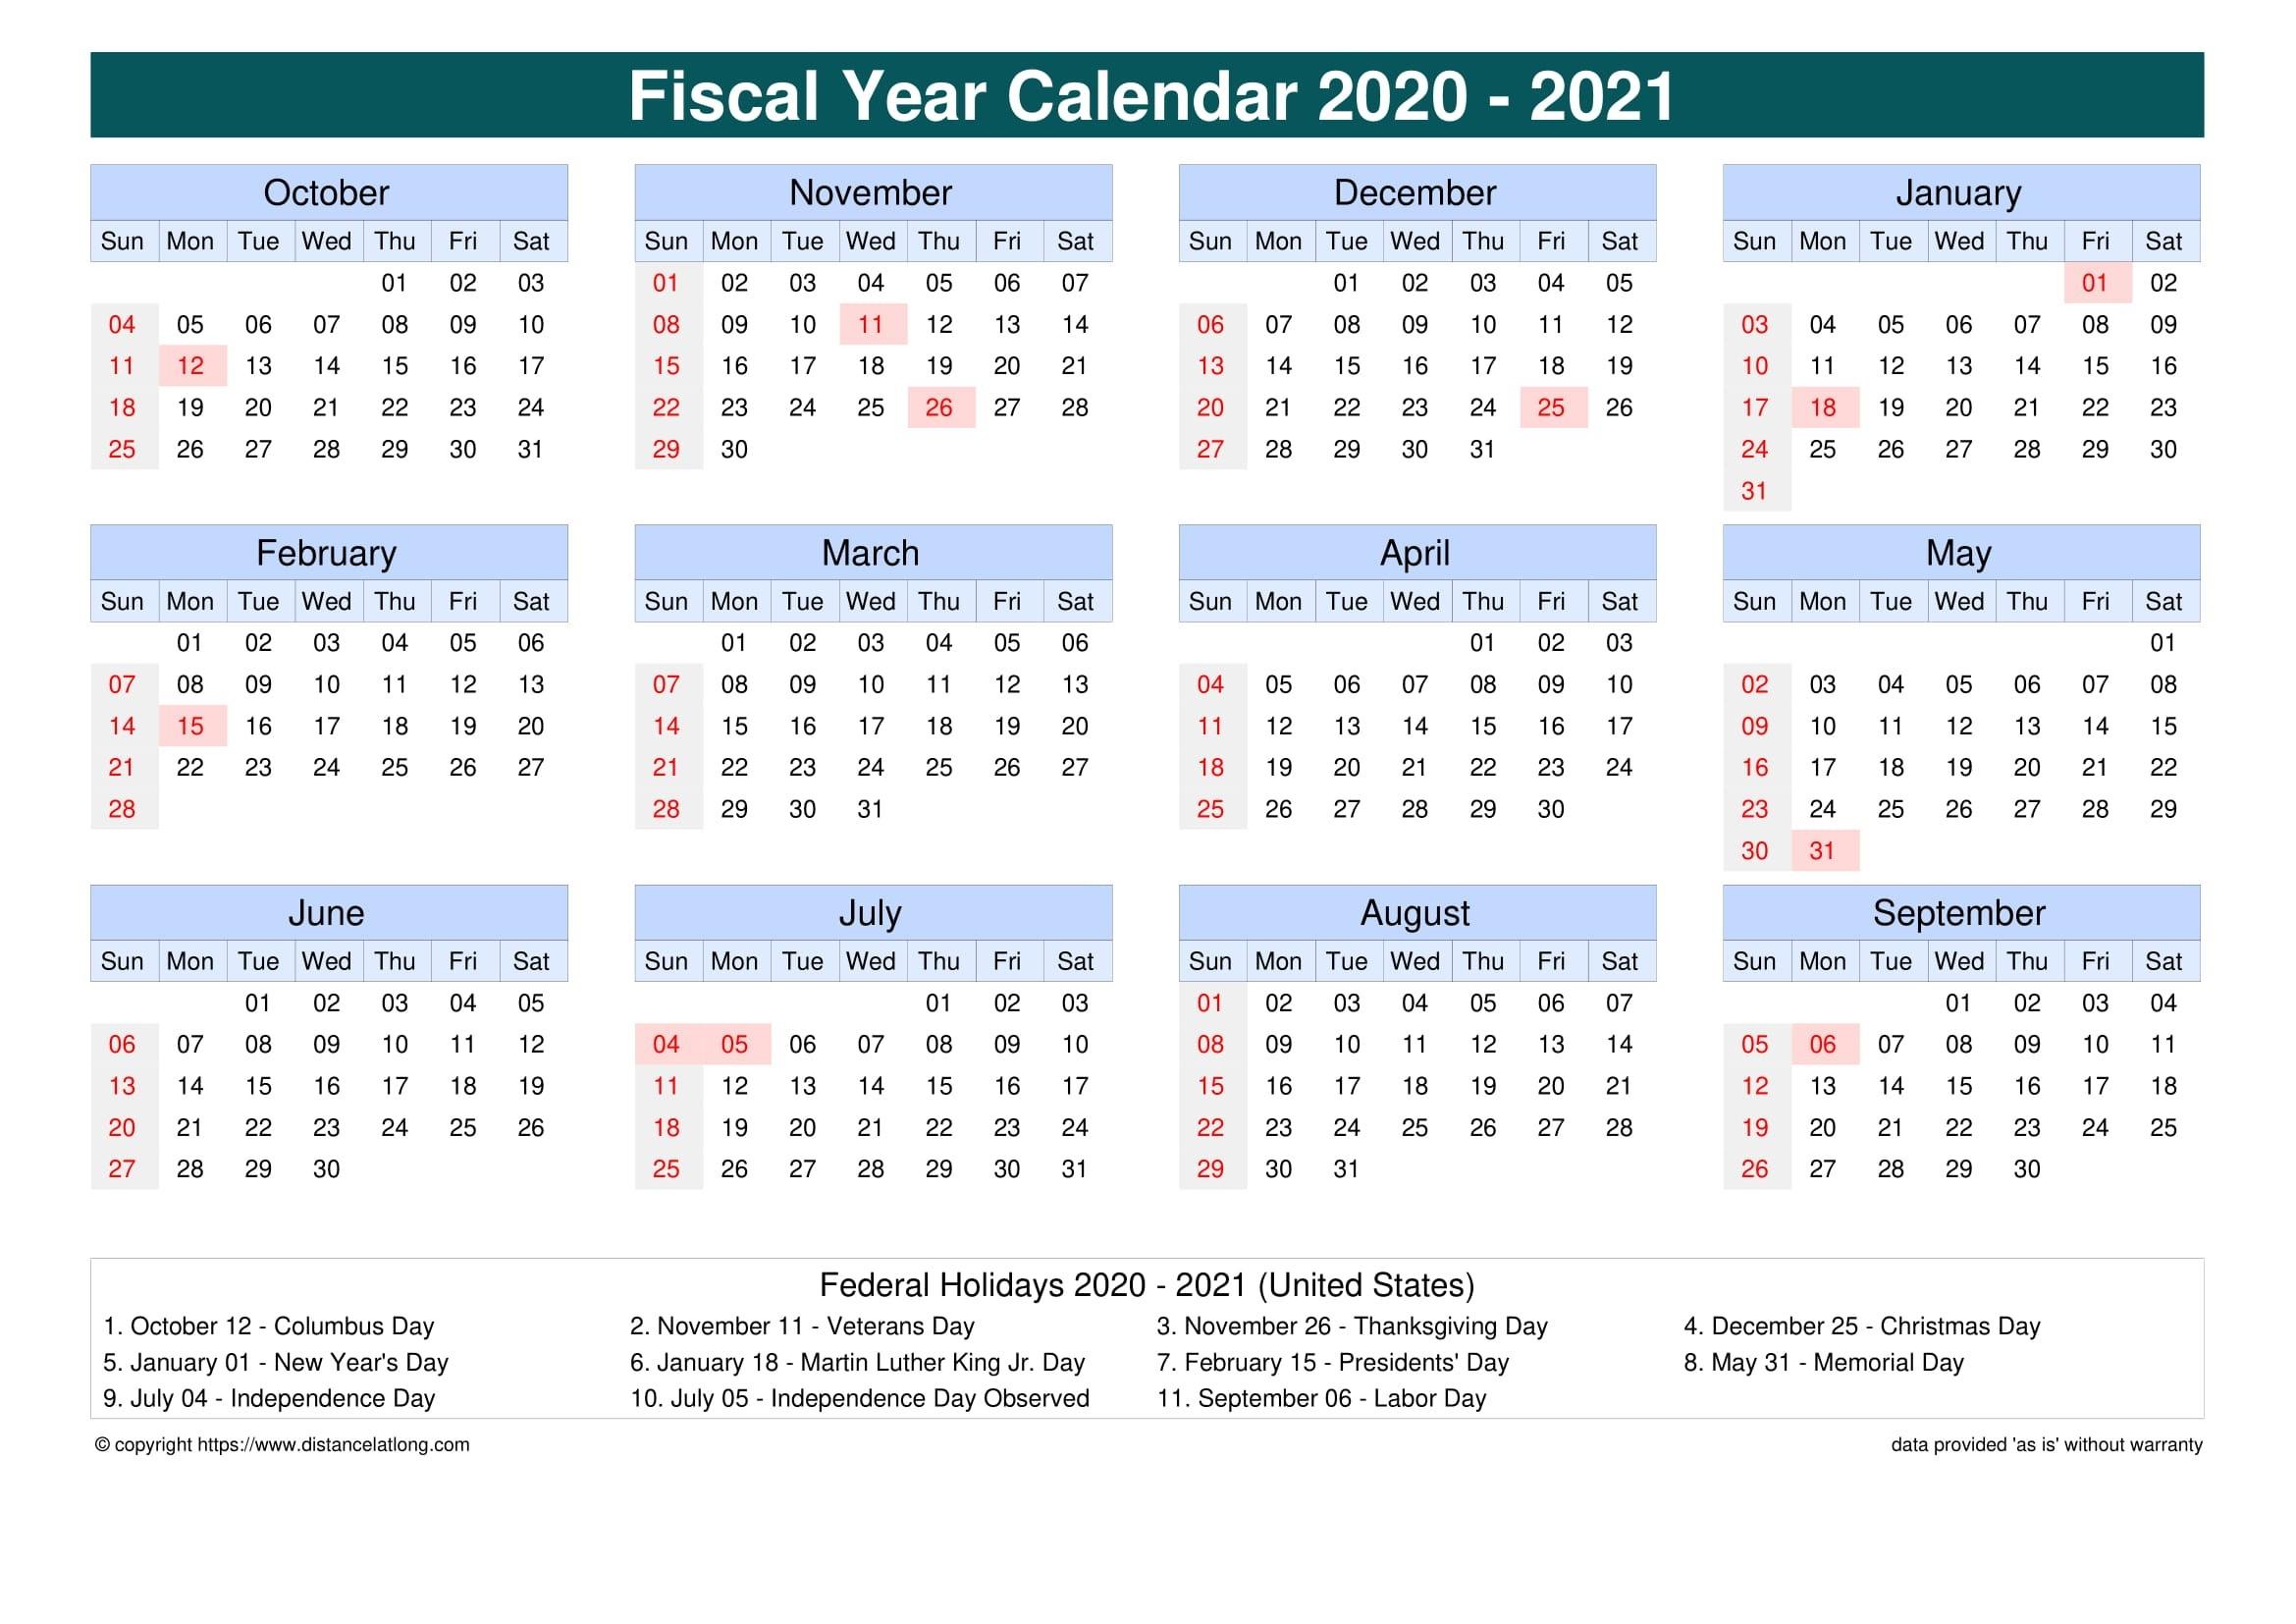 Fiscal Year 2020-2021 Calendar Templates, Free Printable  2021 19 Financial Year Calendar